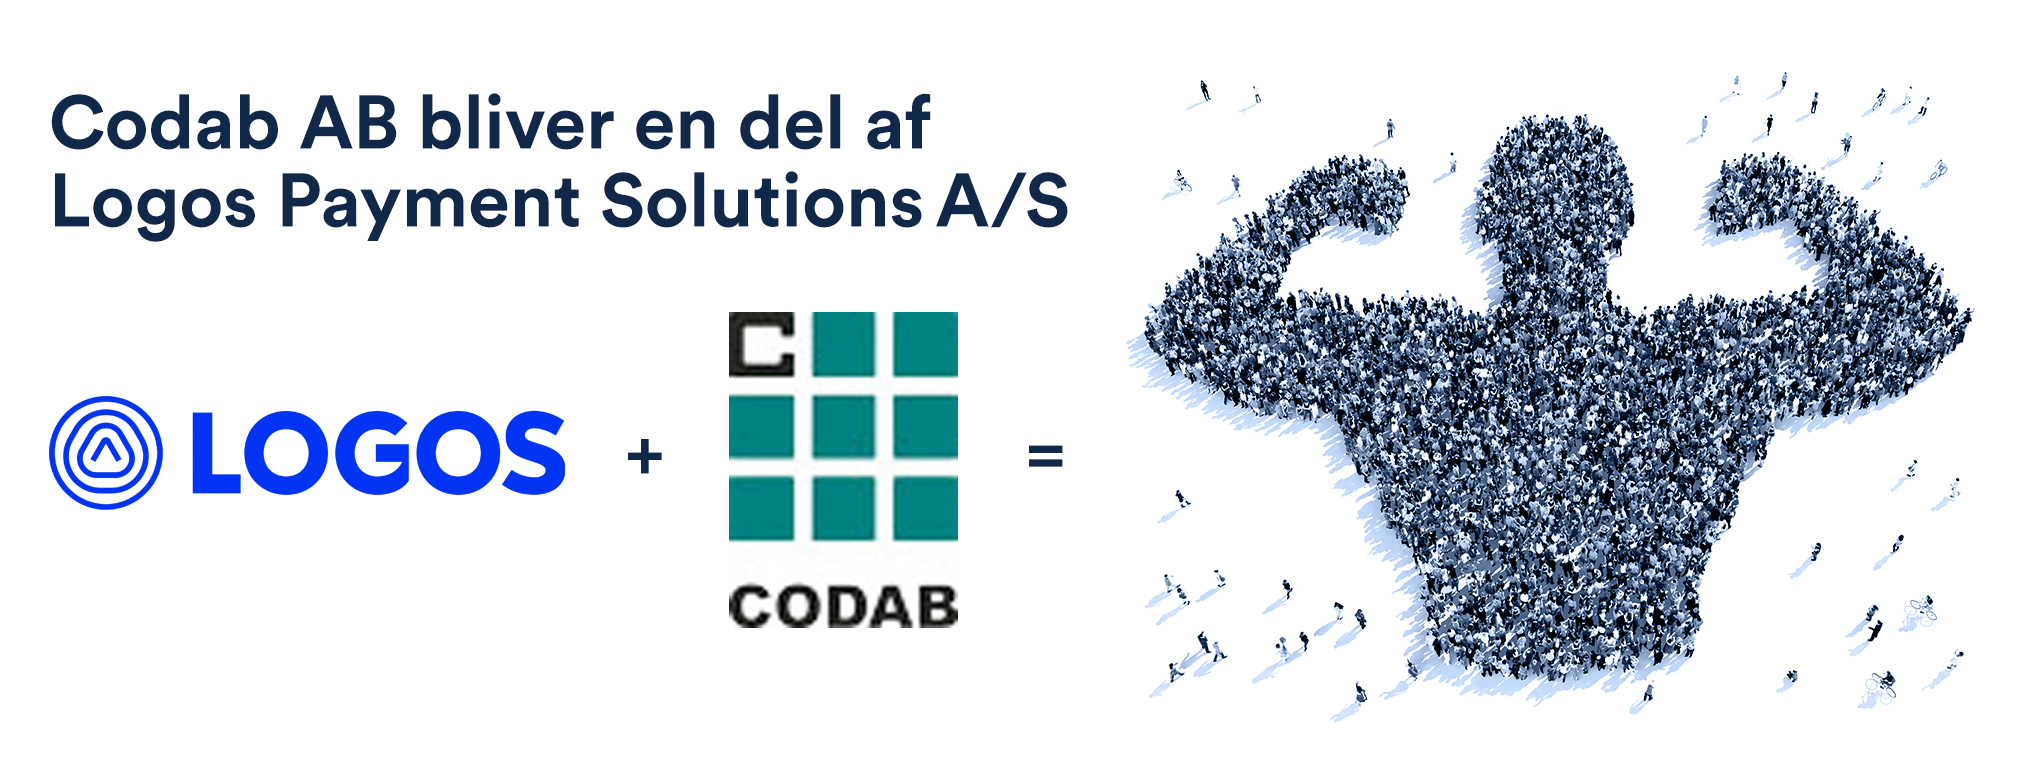 Codab AB bliver en del af Logos Payment Solutions A/S